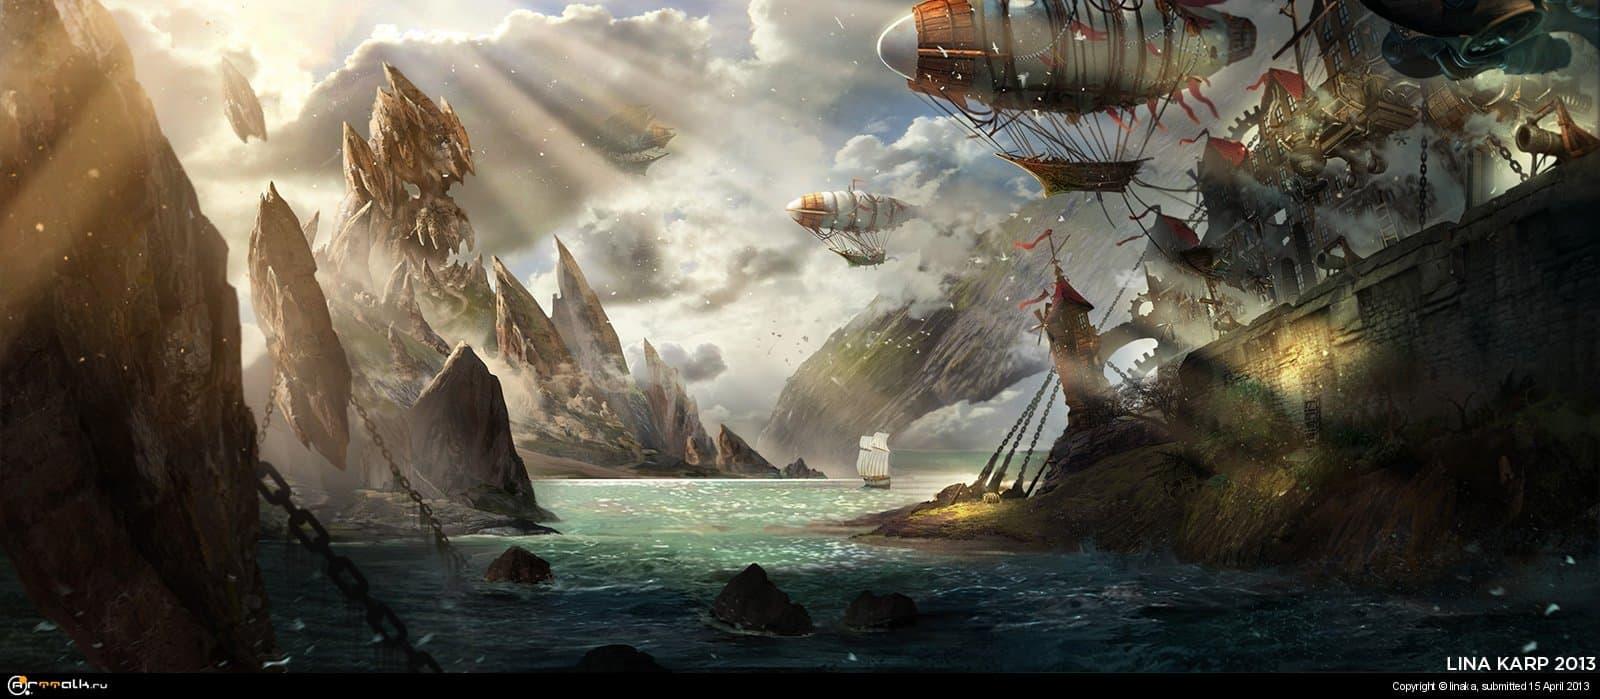 Пиратский пейзаж